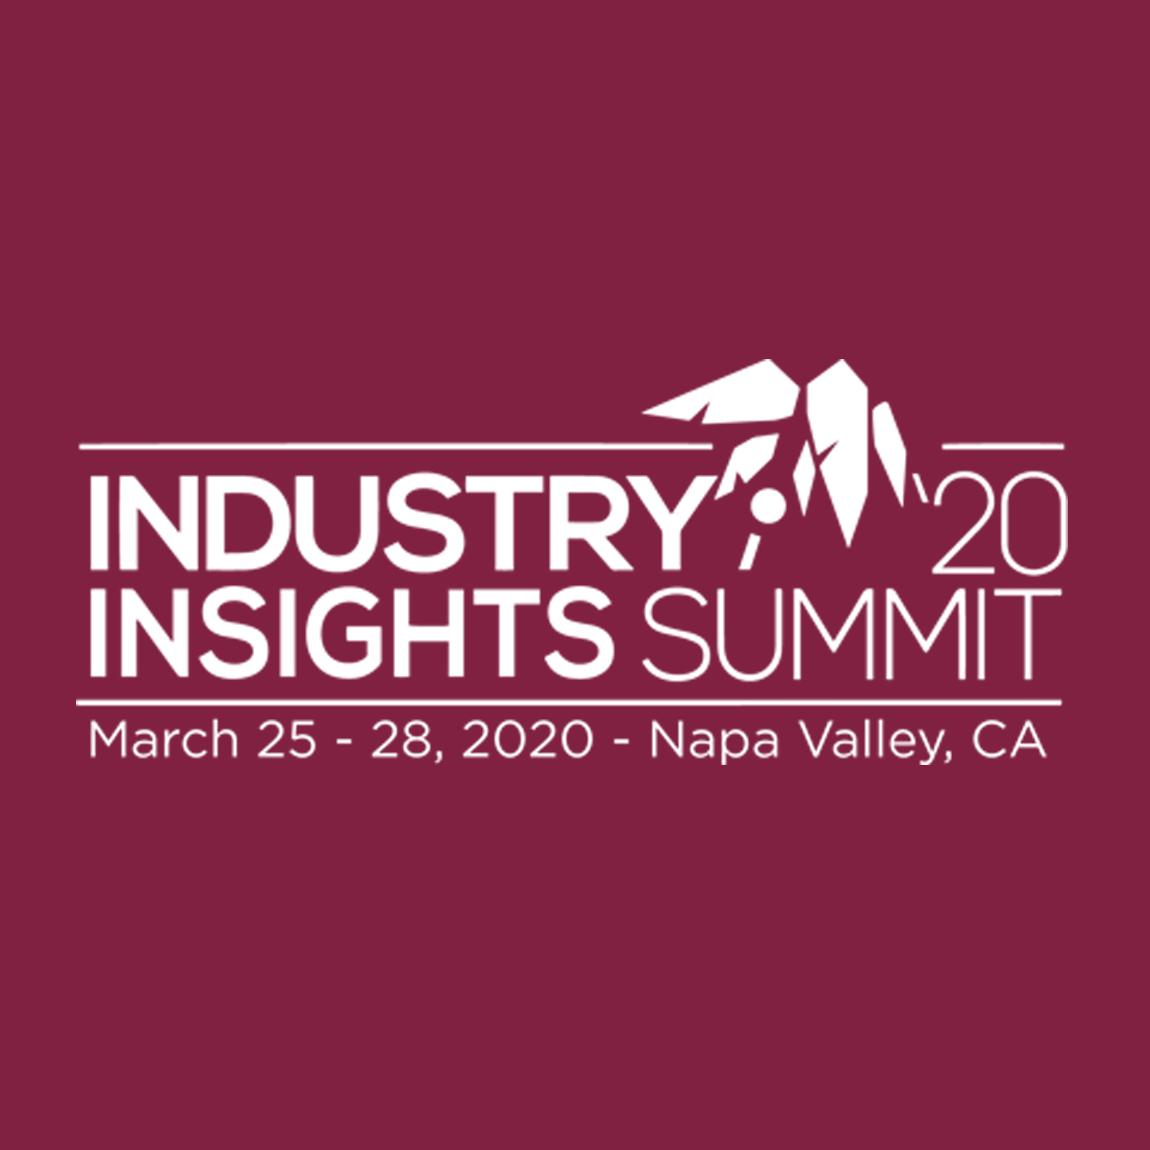 Industry Insights Summit